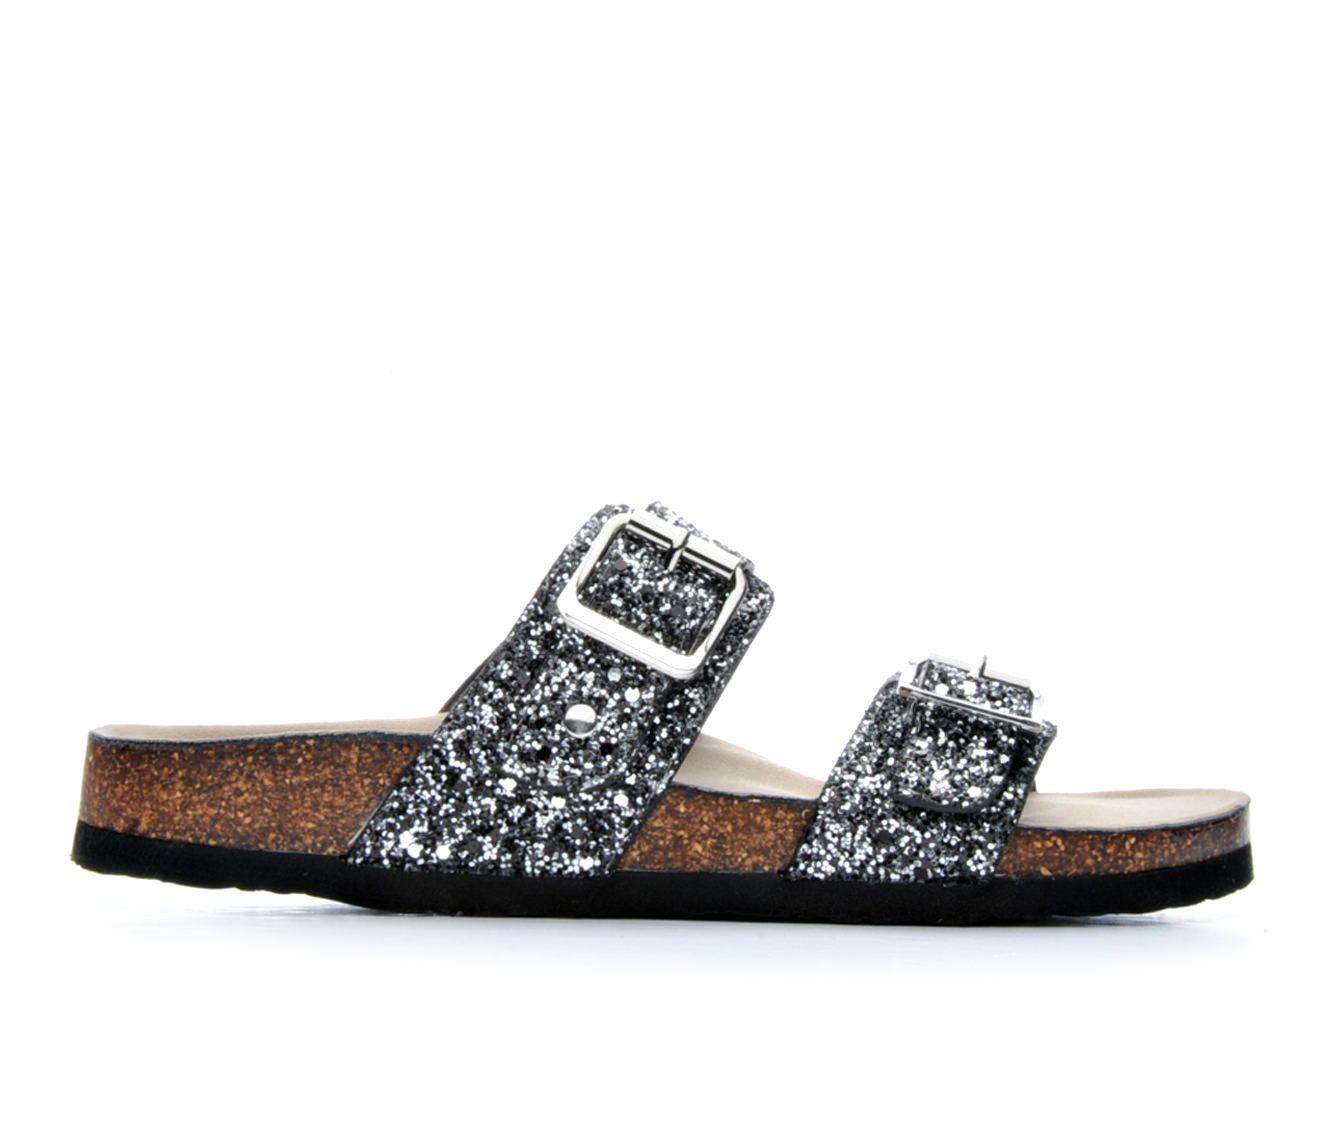 Women's Madden Girl Brando Sandals (Silver)